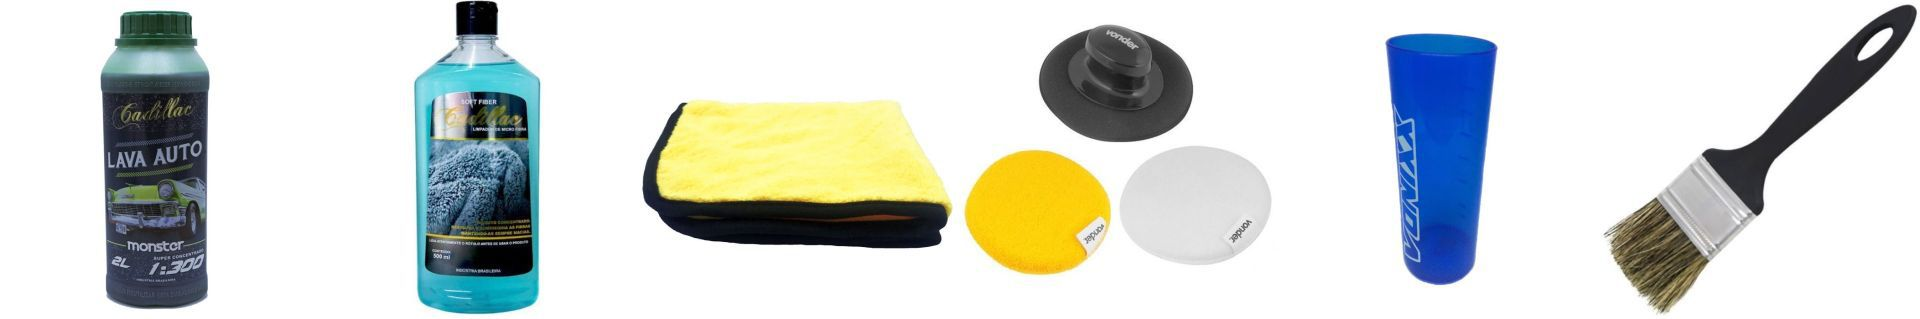 Kit Pincel+Copo+Lava Auto+Kit Polimento+Toalha+Limpador De Microfibra